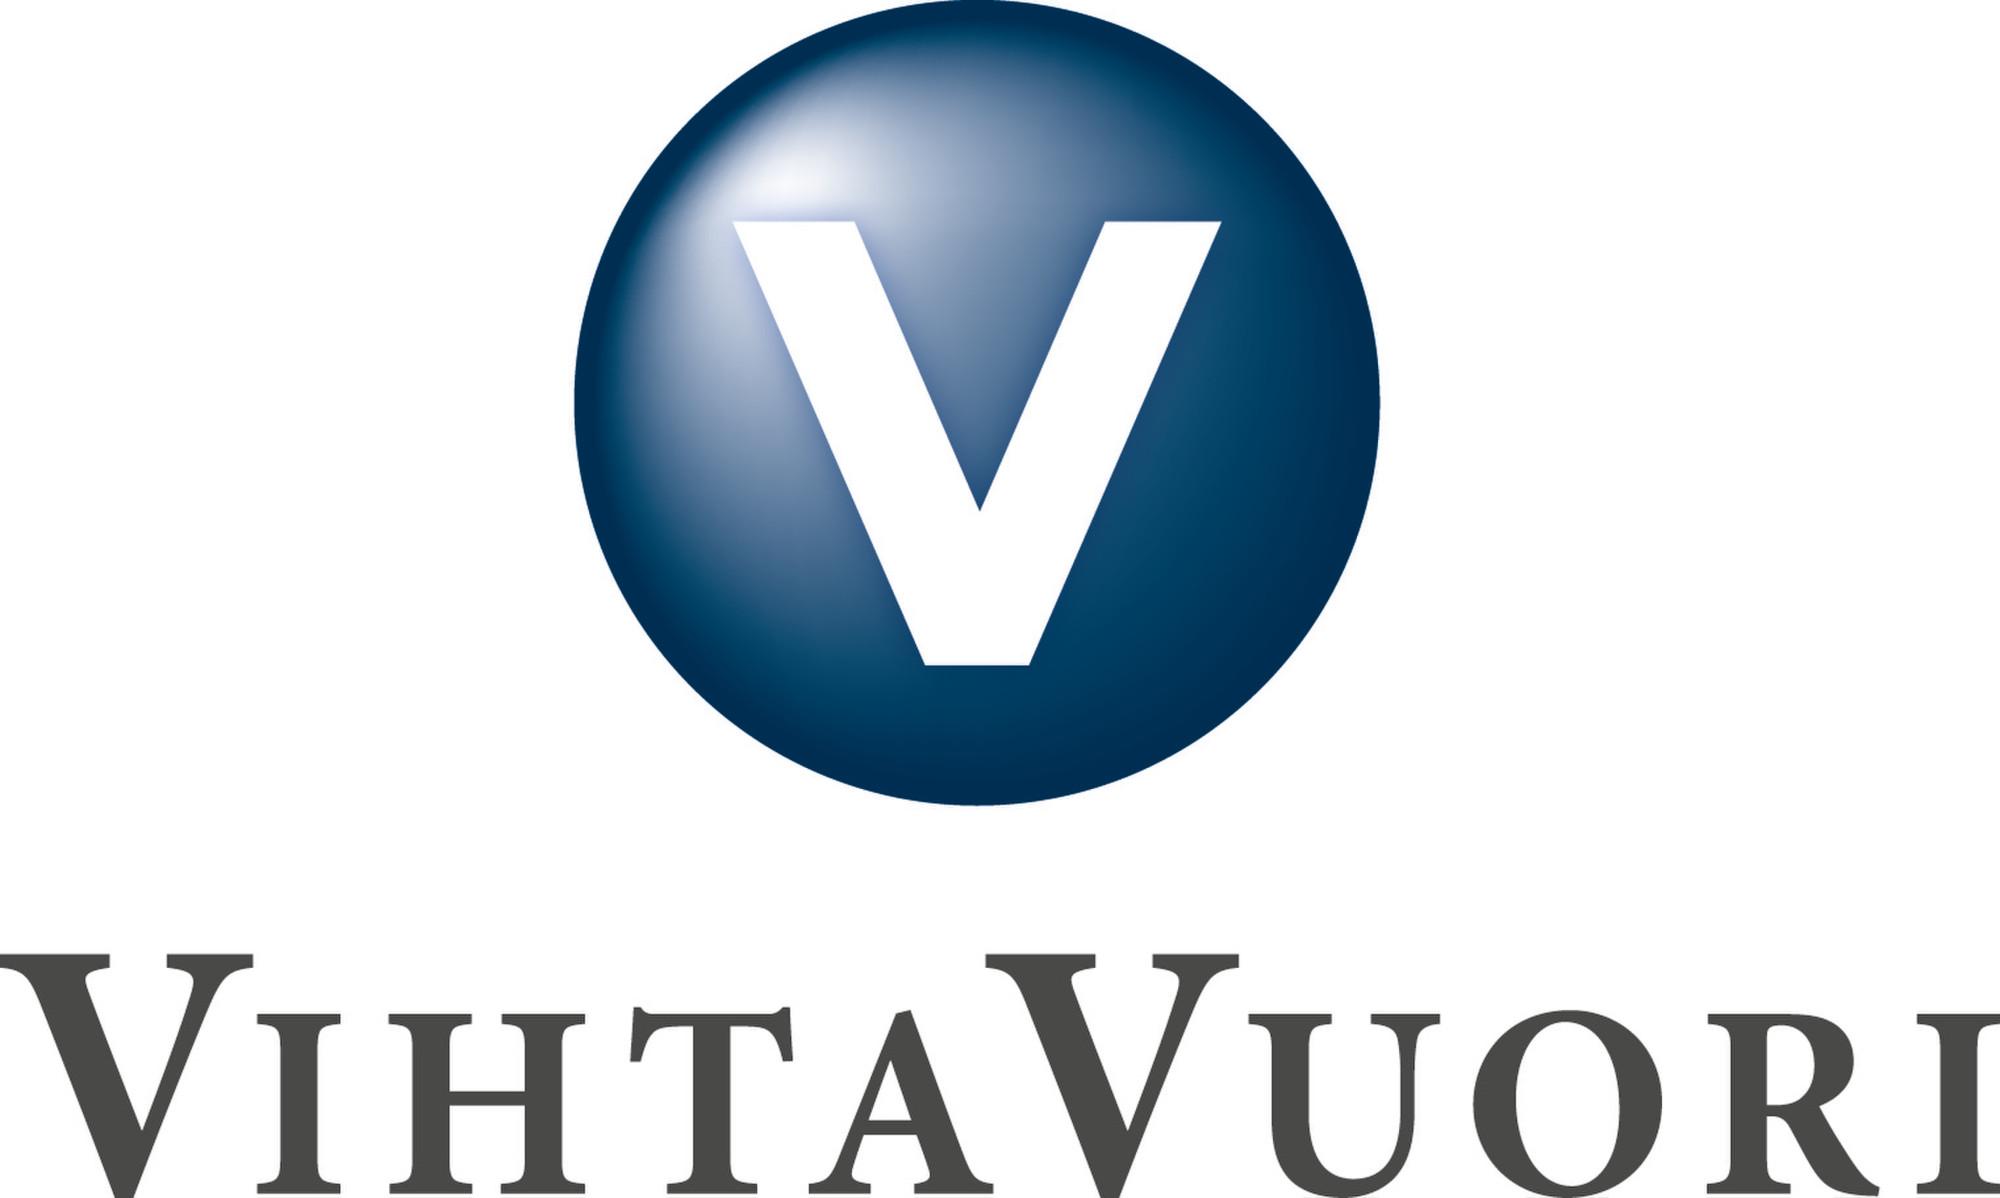 vihtavuori_logo